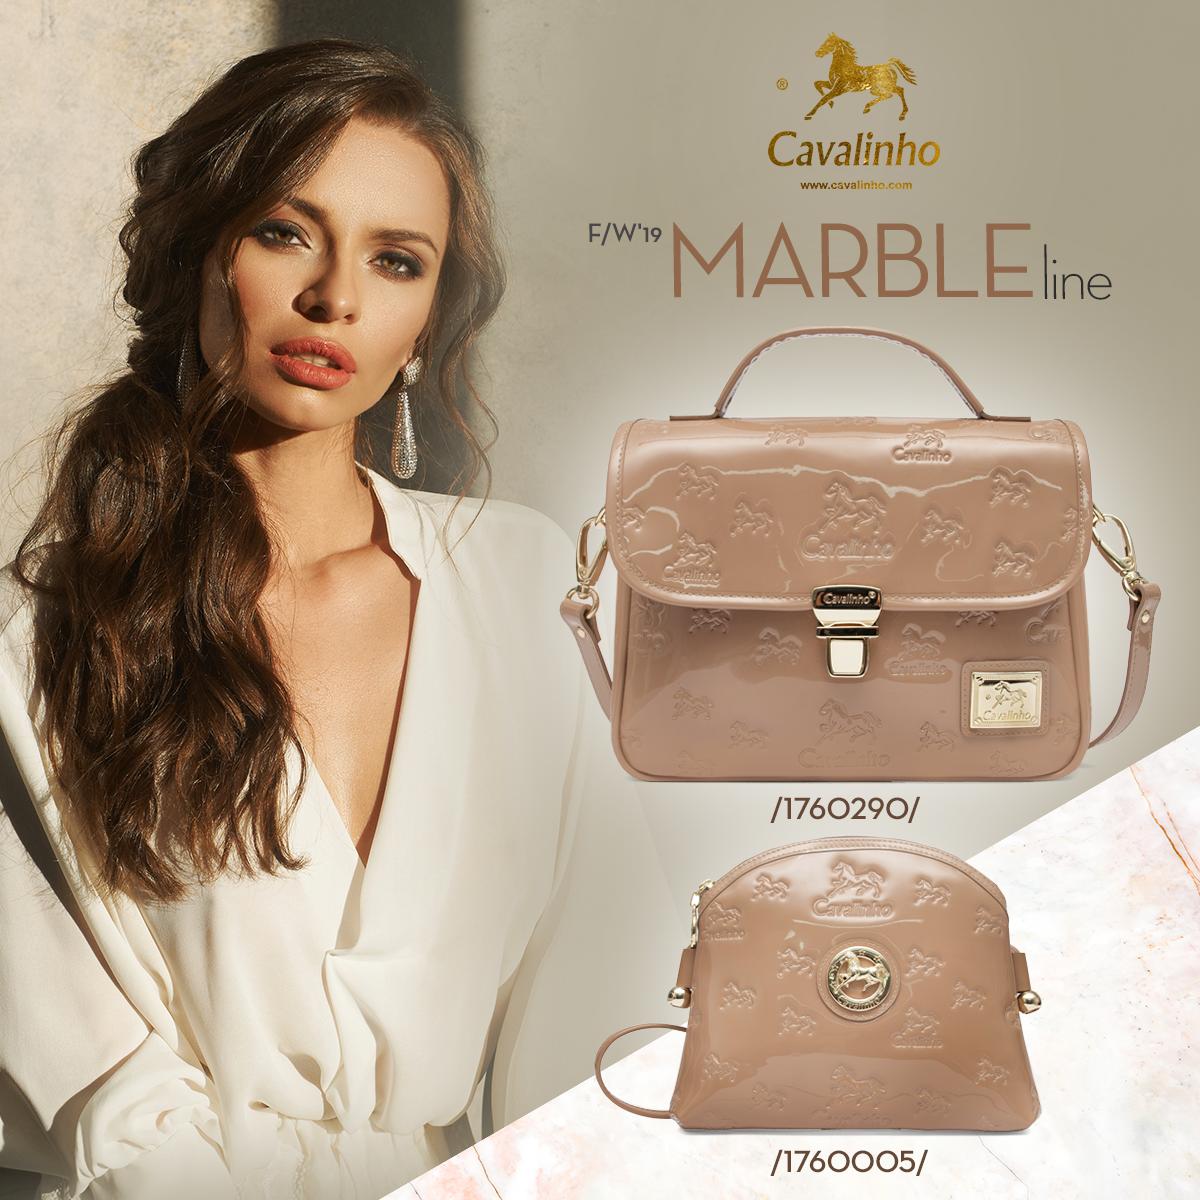 52_marbleline_05